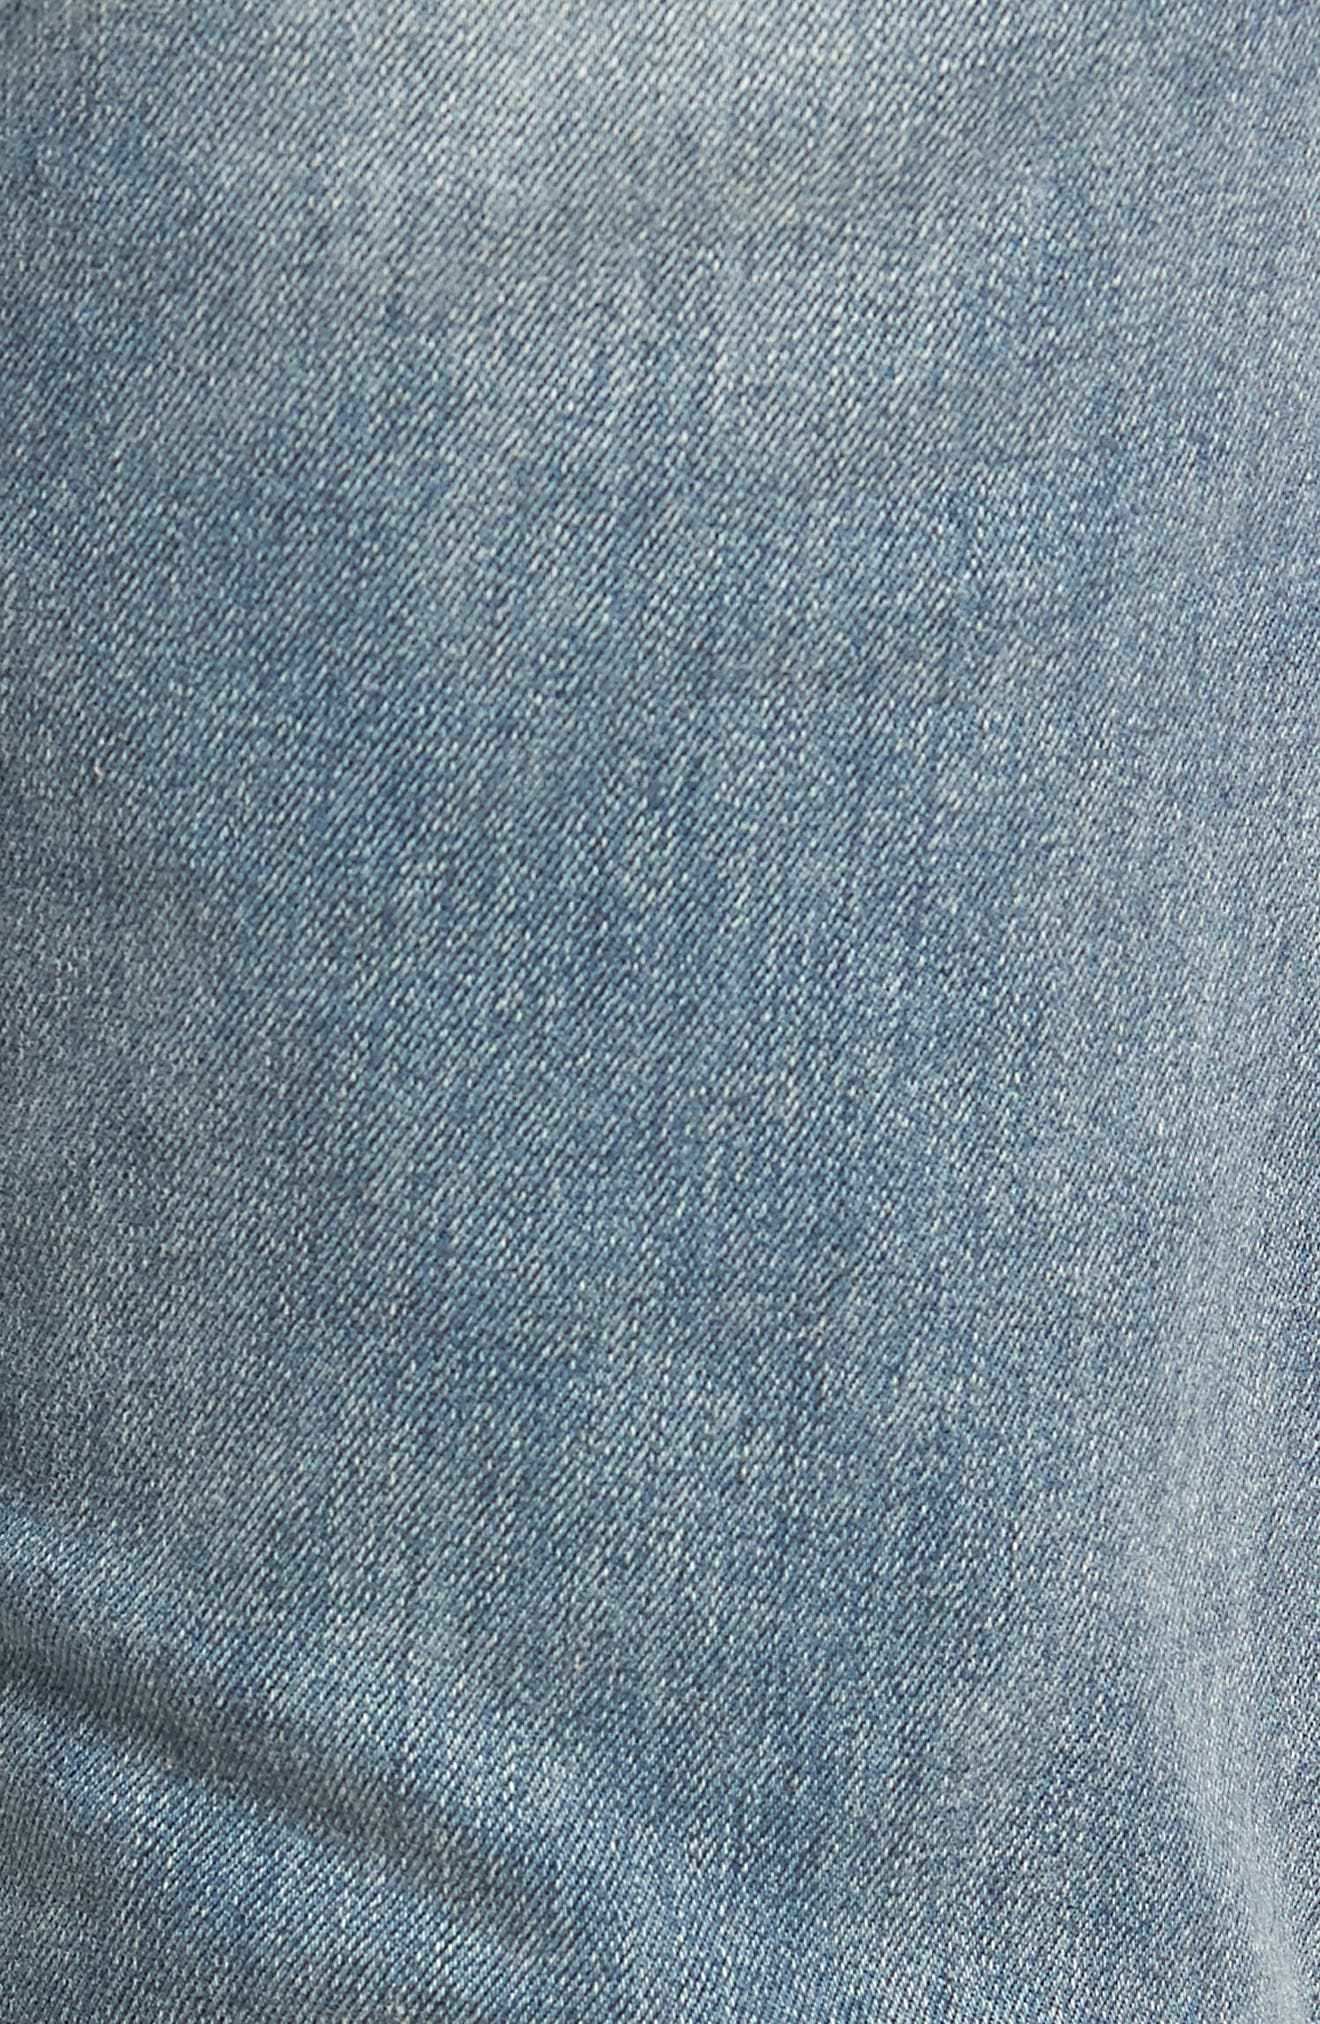 Salerno Flex Jeans,                             Alternate thumbnail 5, color,                             ABANDONED BLUE